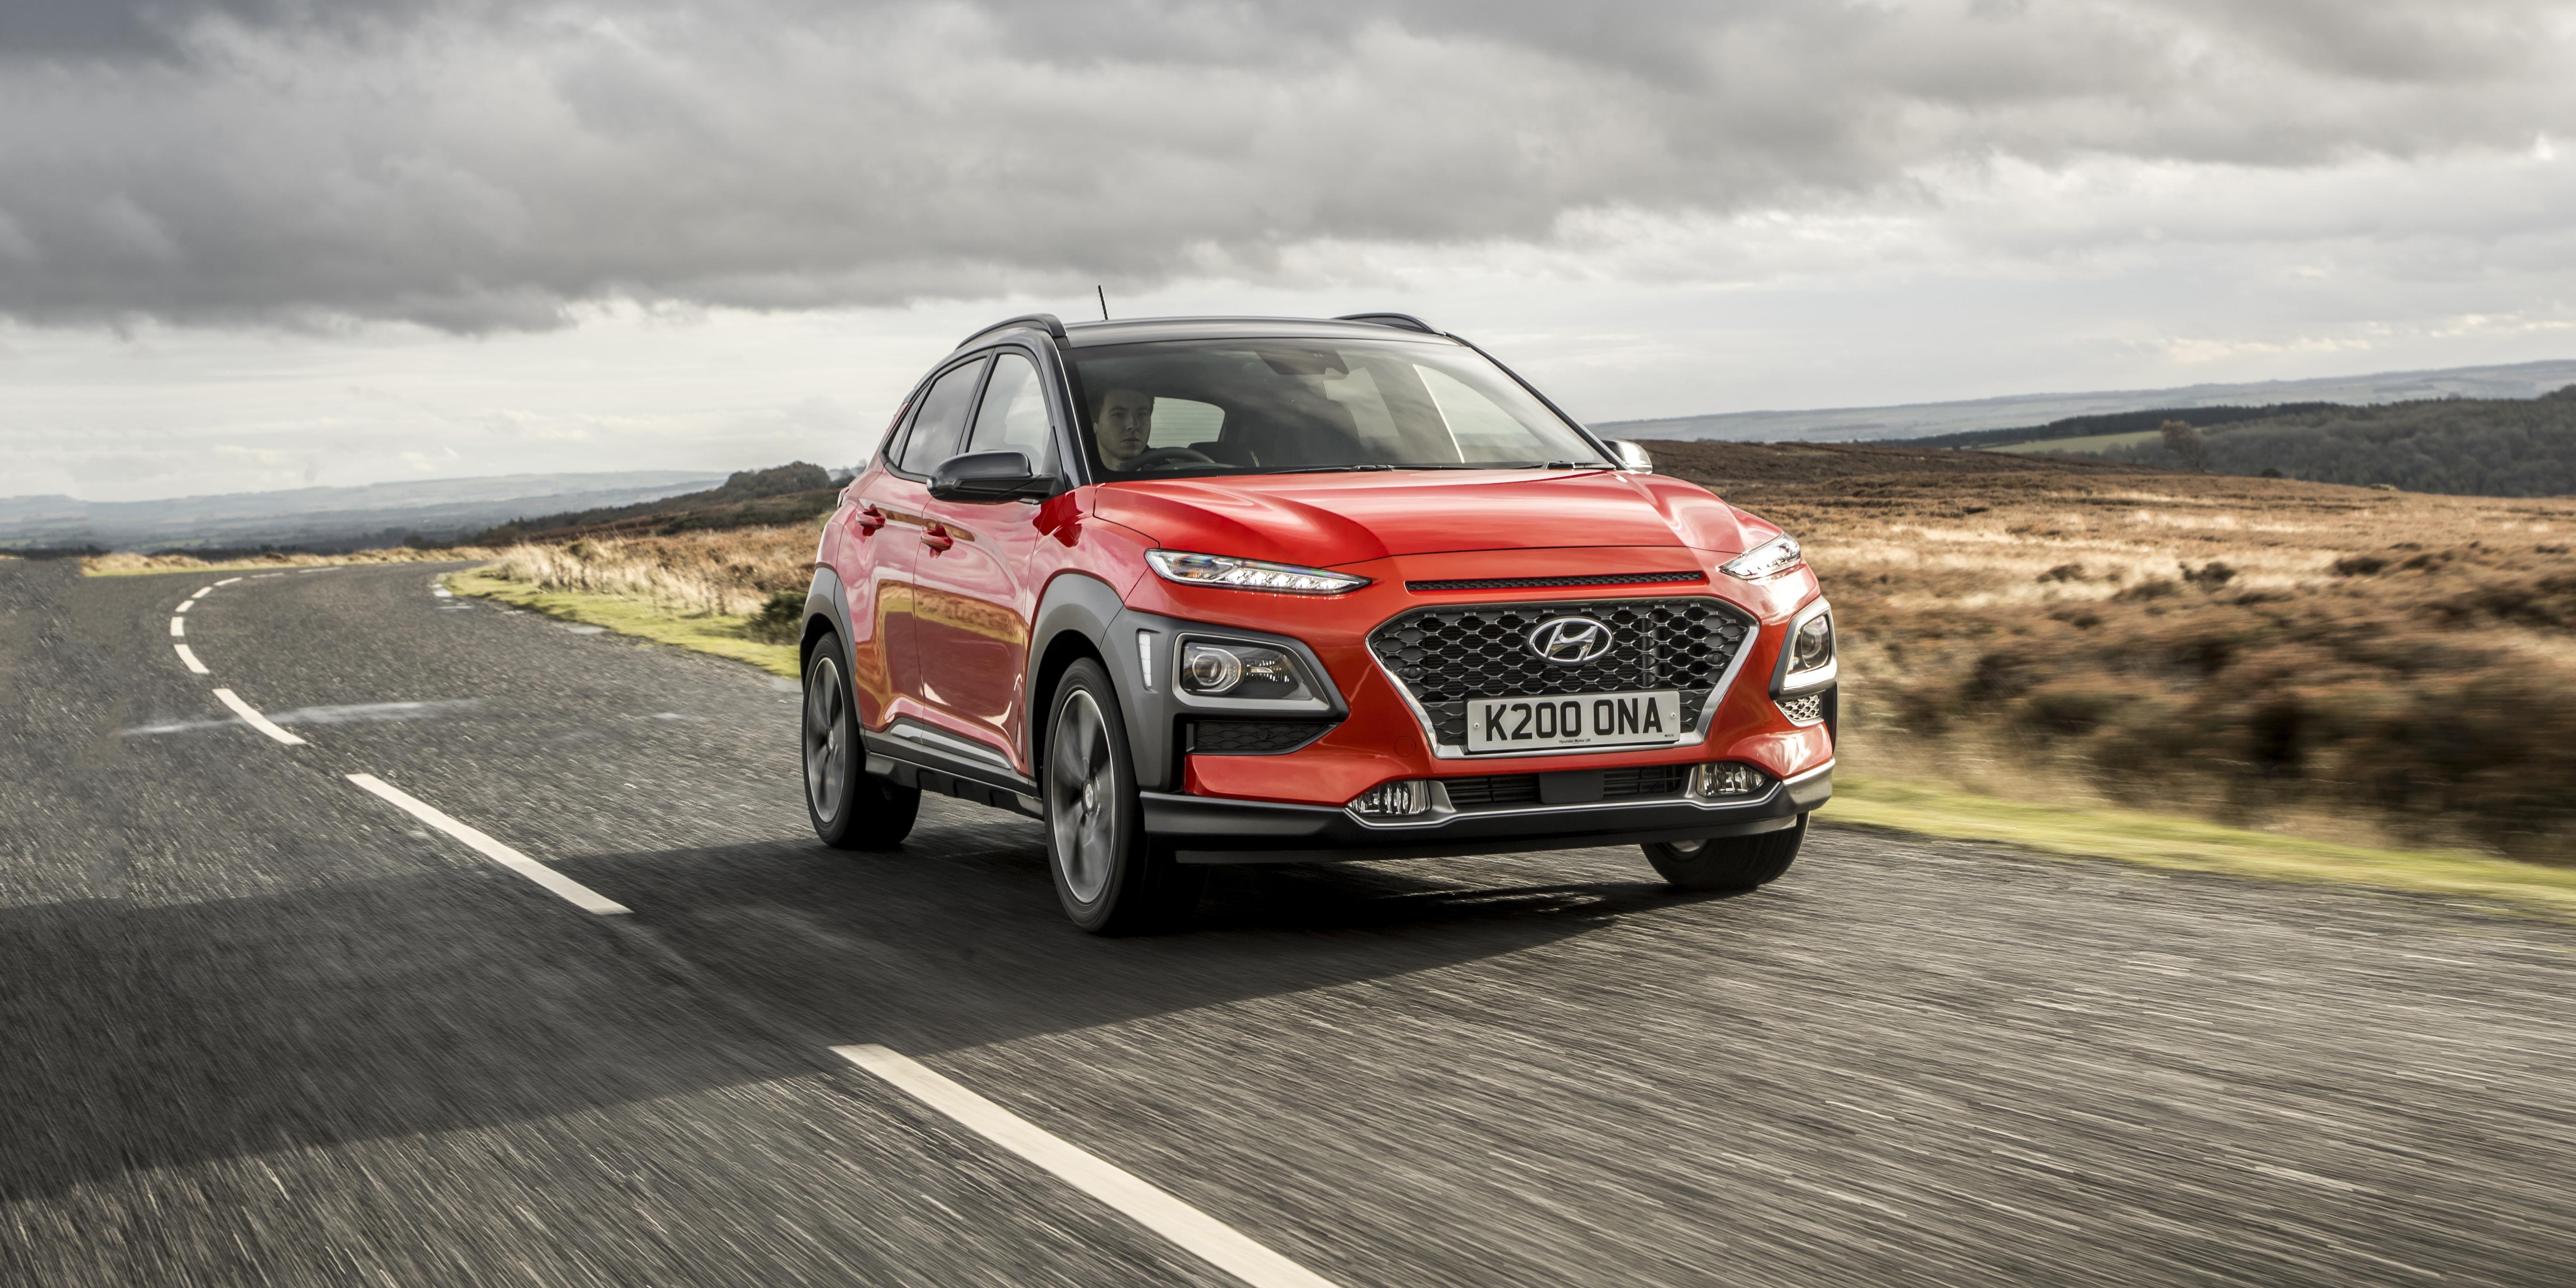 2020 Hyundai Kona Review, Specs And Price >> New Hyundai Kona Review Carwow